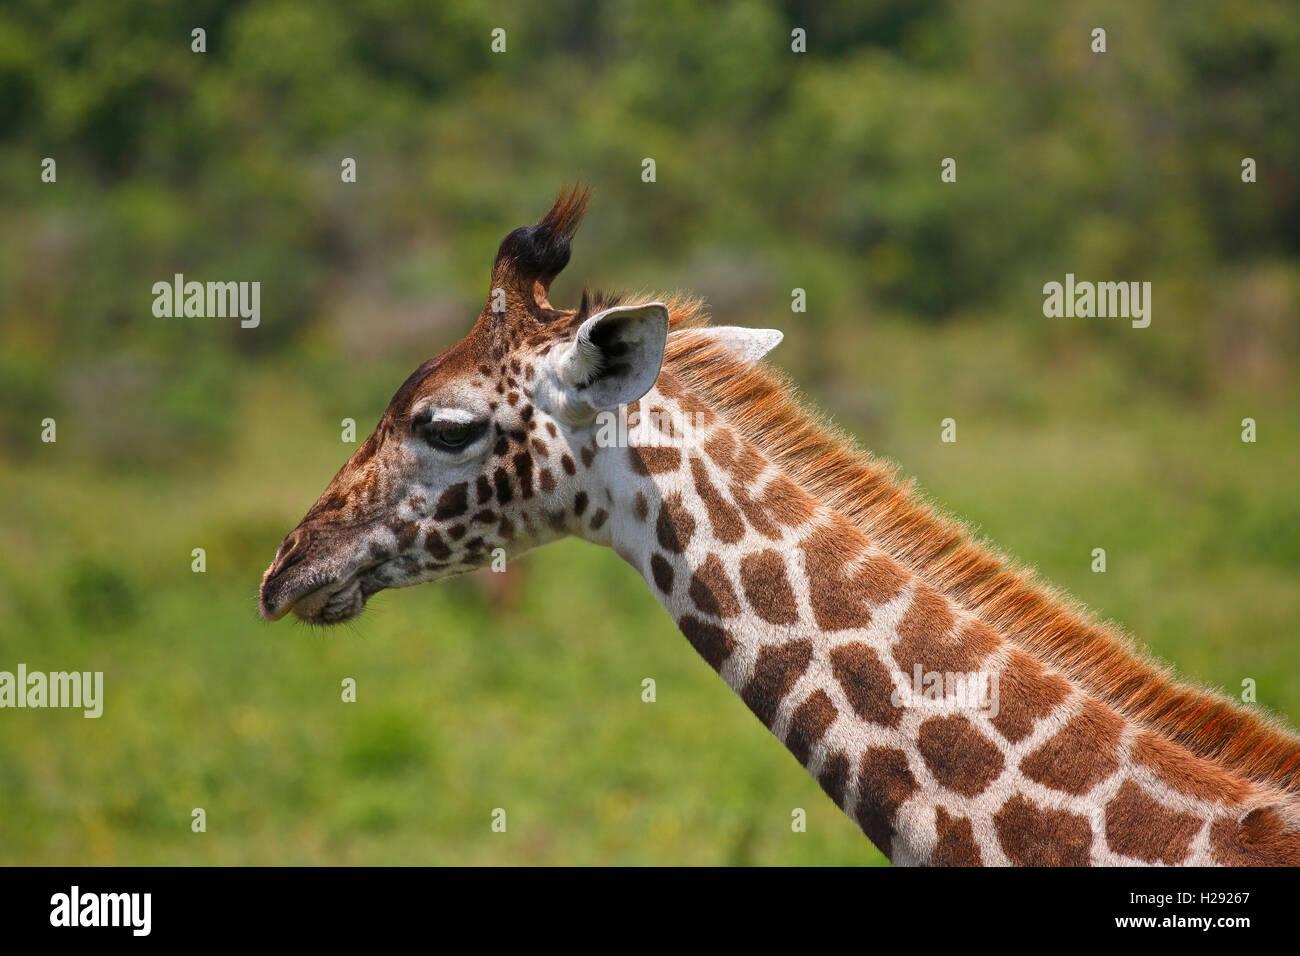 Maasai giraffe (Giraffa camelopardalis), portrait, Arusha National Park, Tanzania - Stock Image